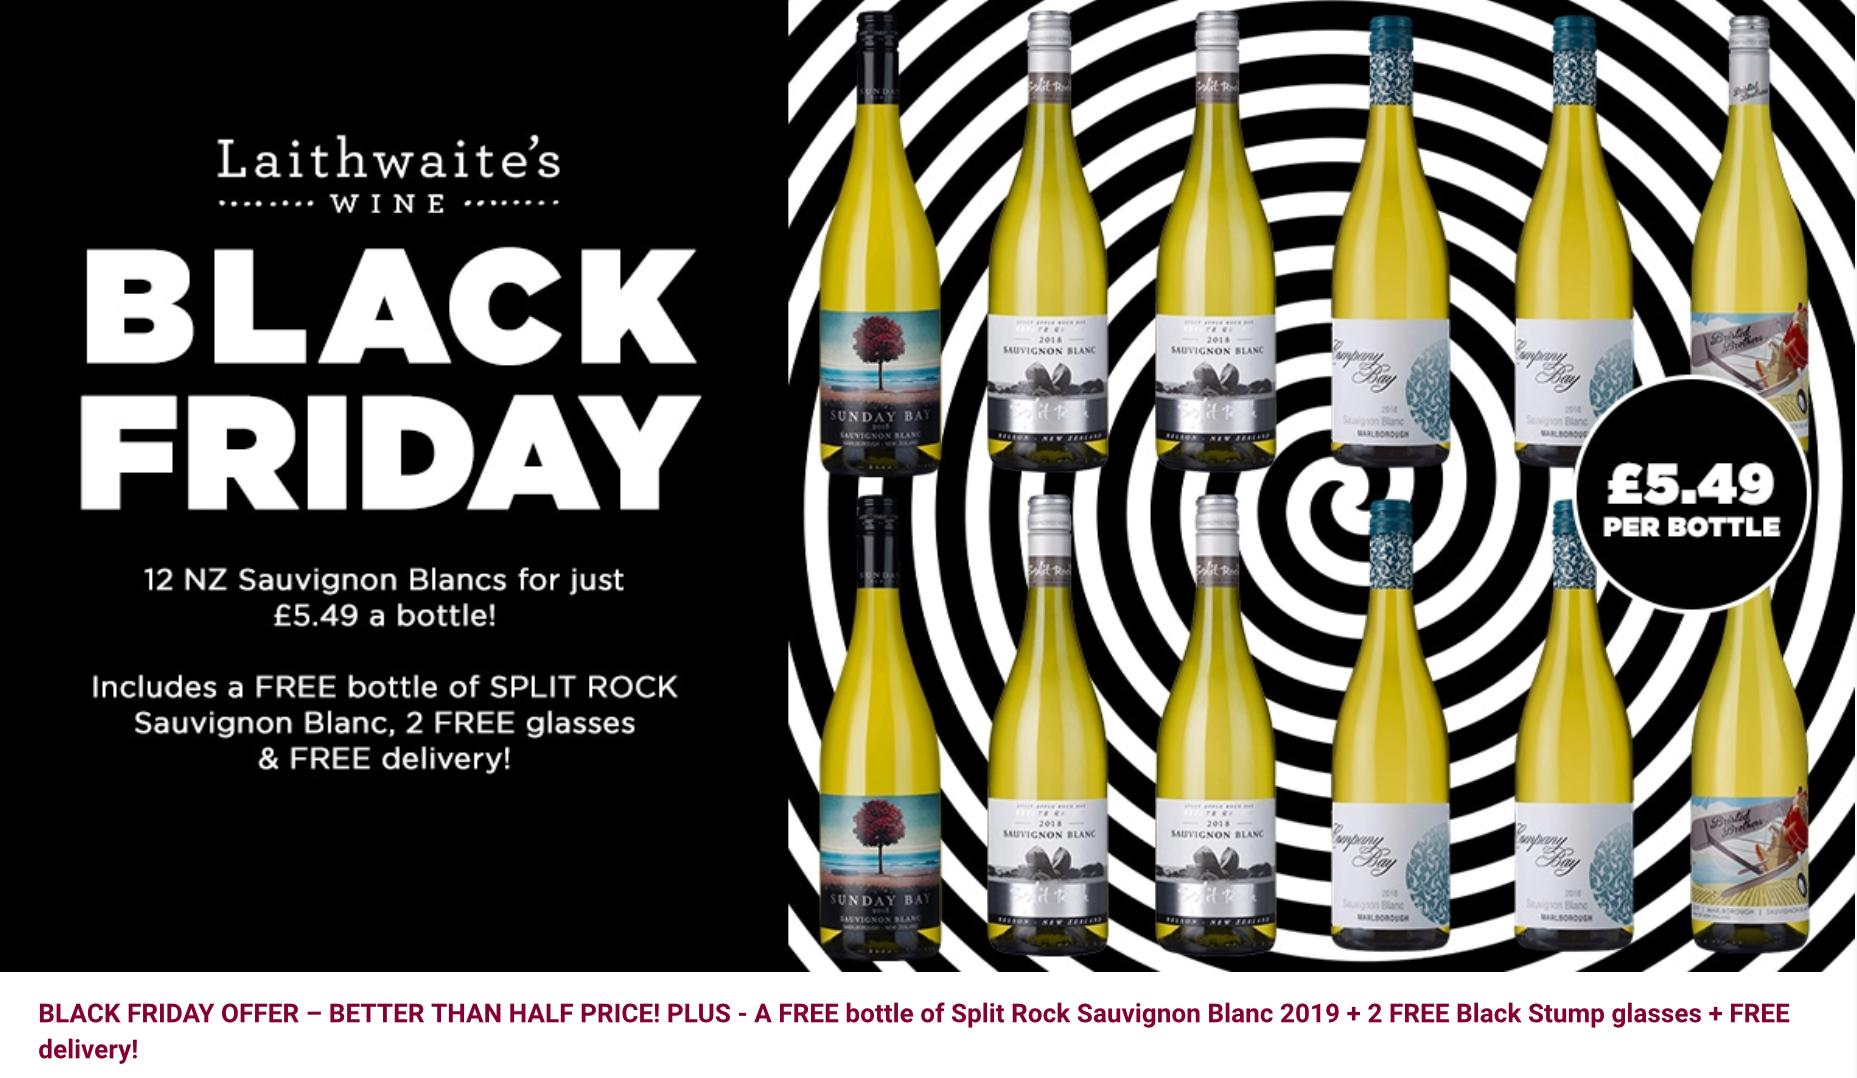 New Zealand Sauvignon Blancs Collection (13 bottles) normally: £147.88 Black Friday Offer Price: £65.88 @ Laithwaites